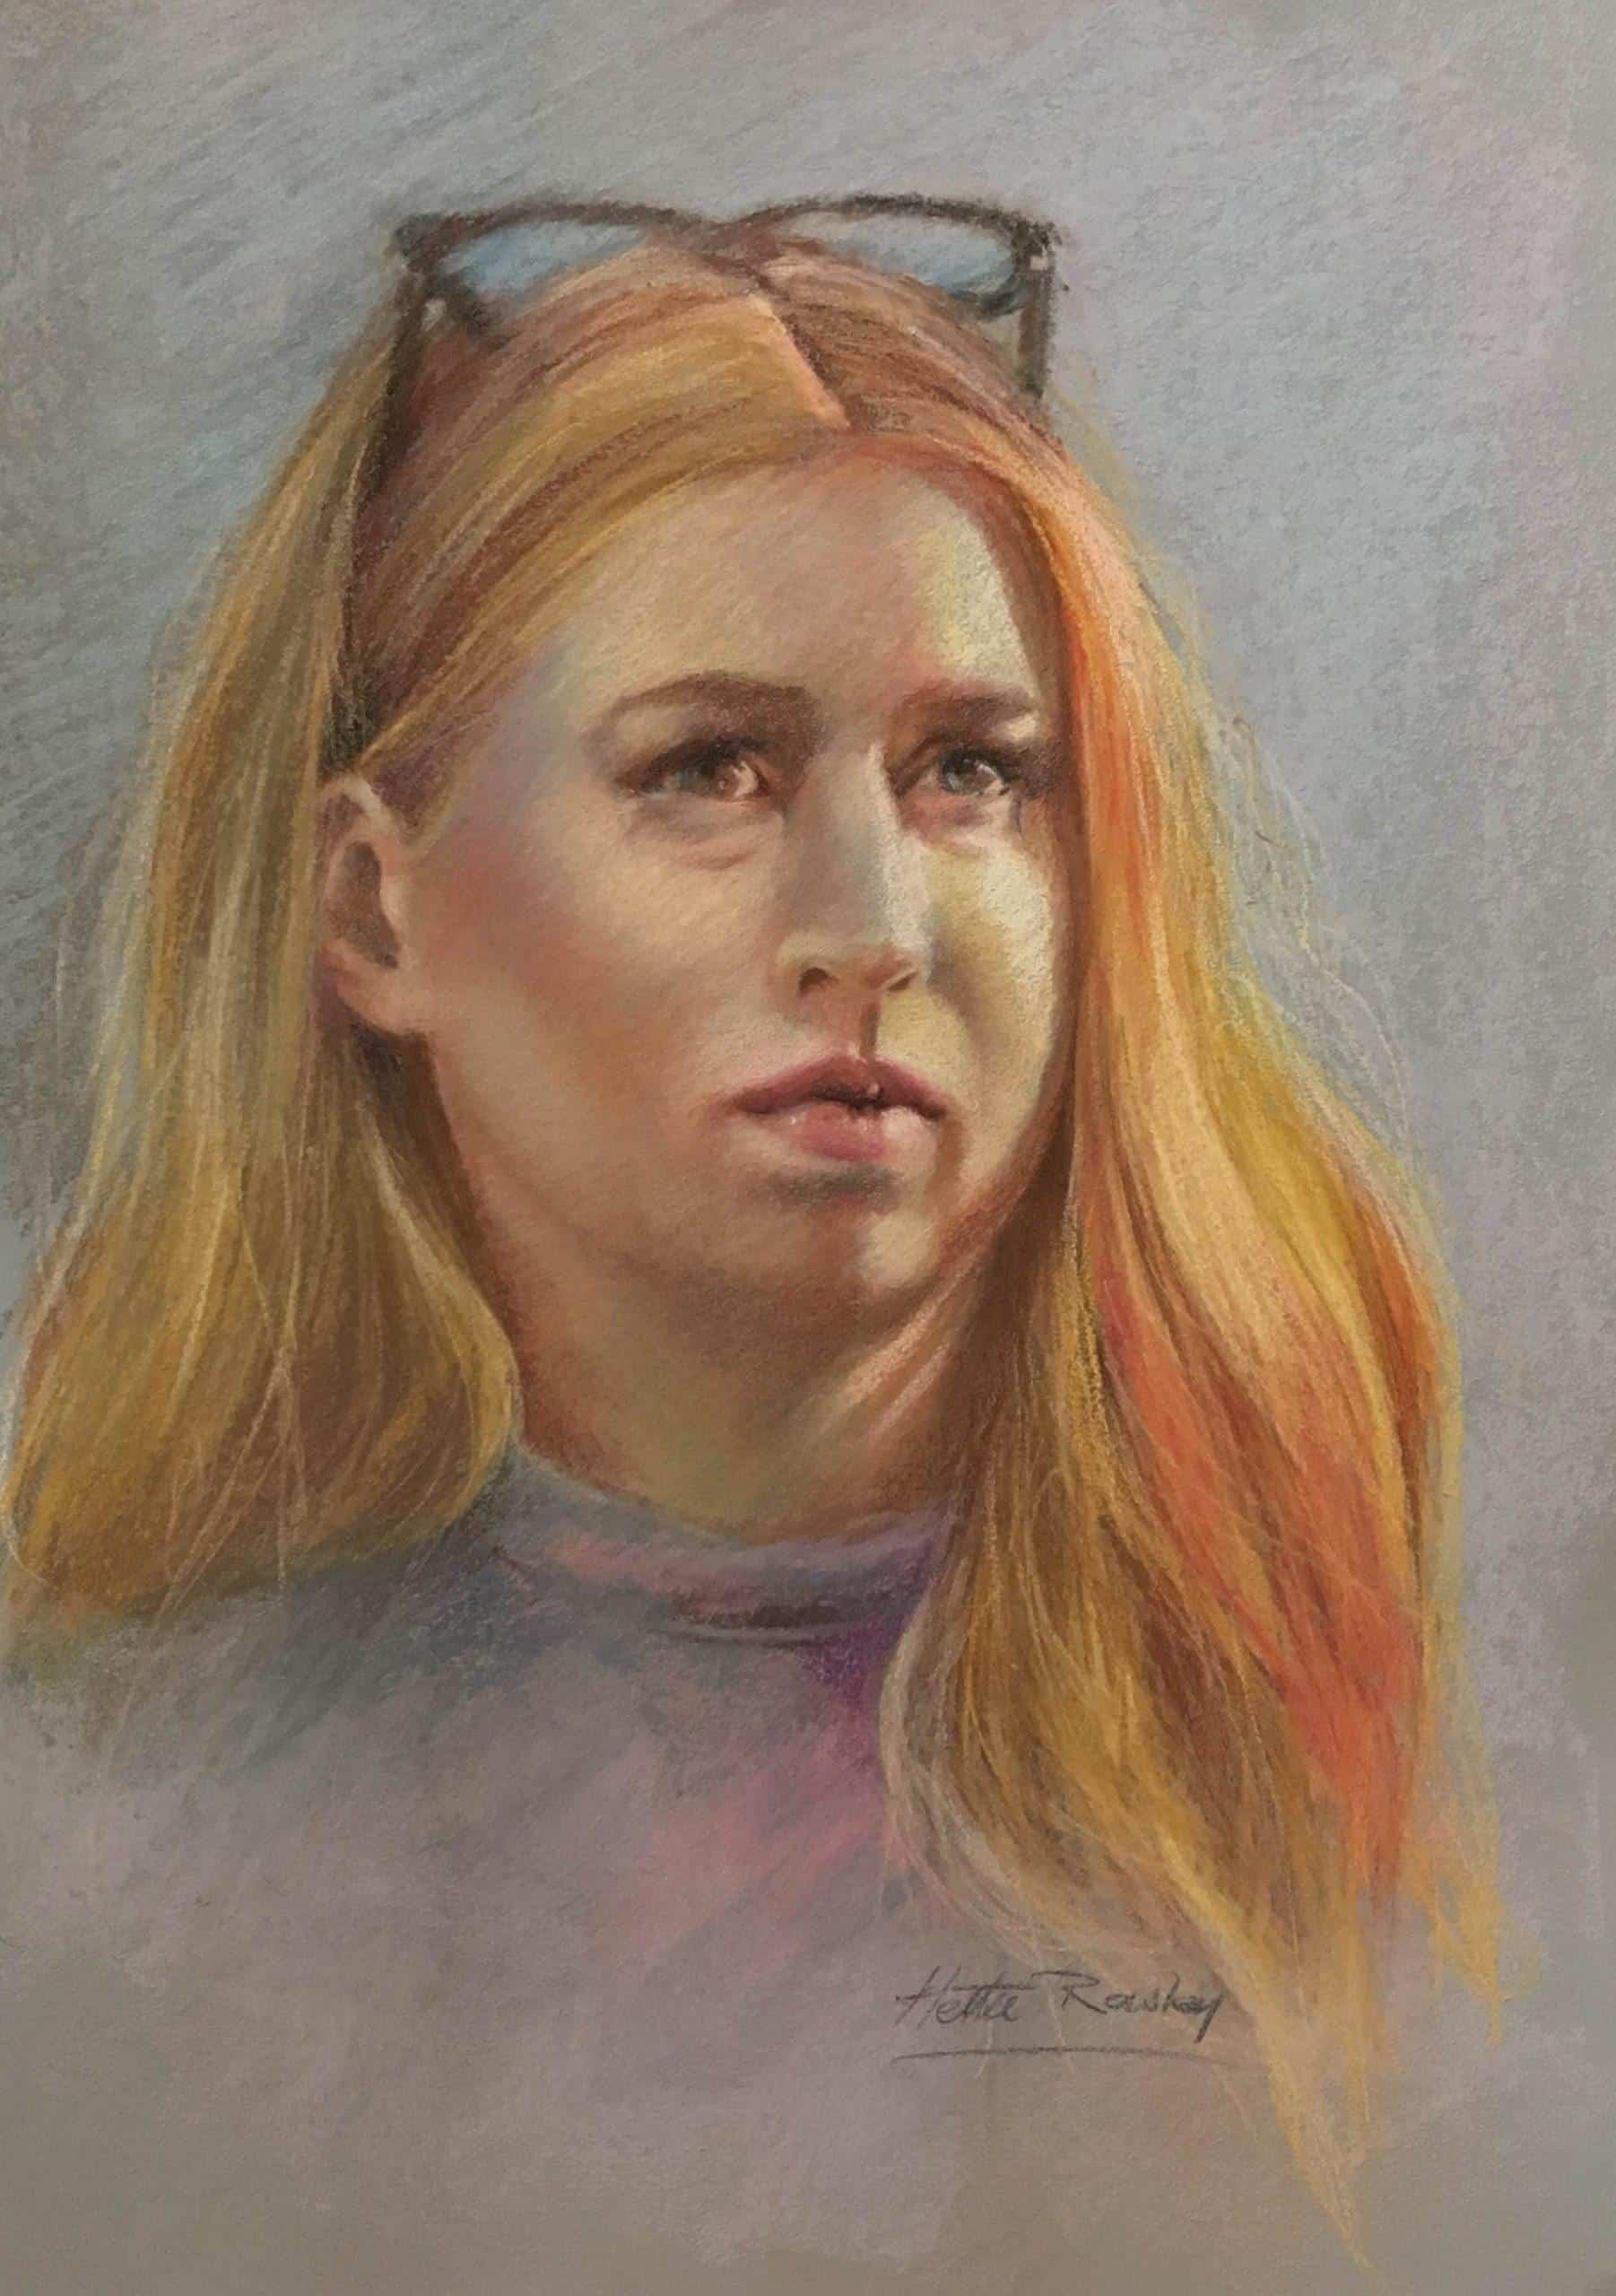 Life drawing portraits